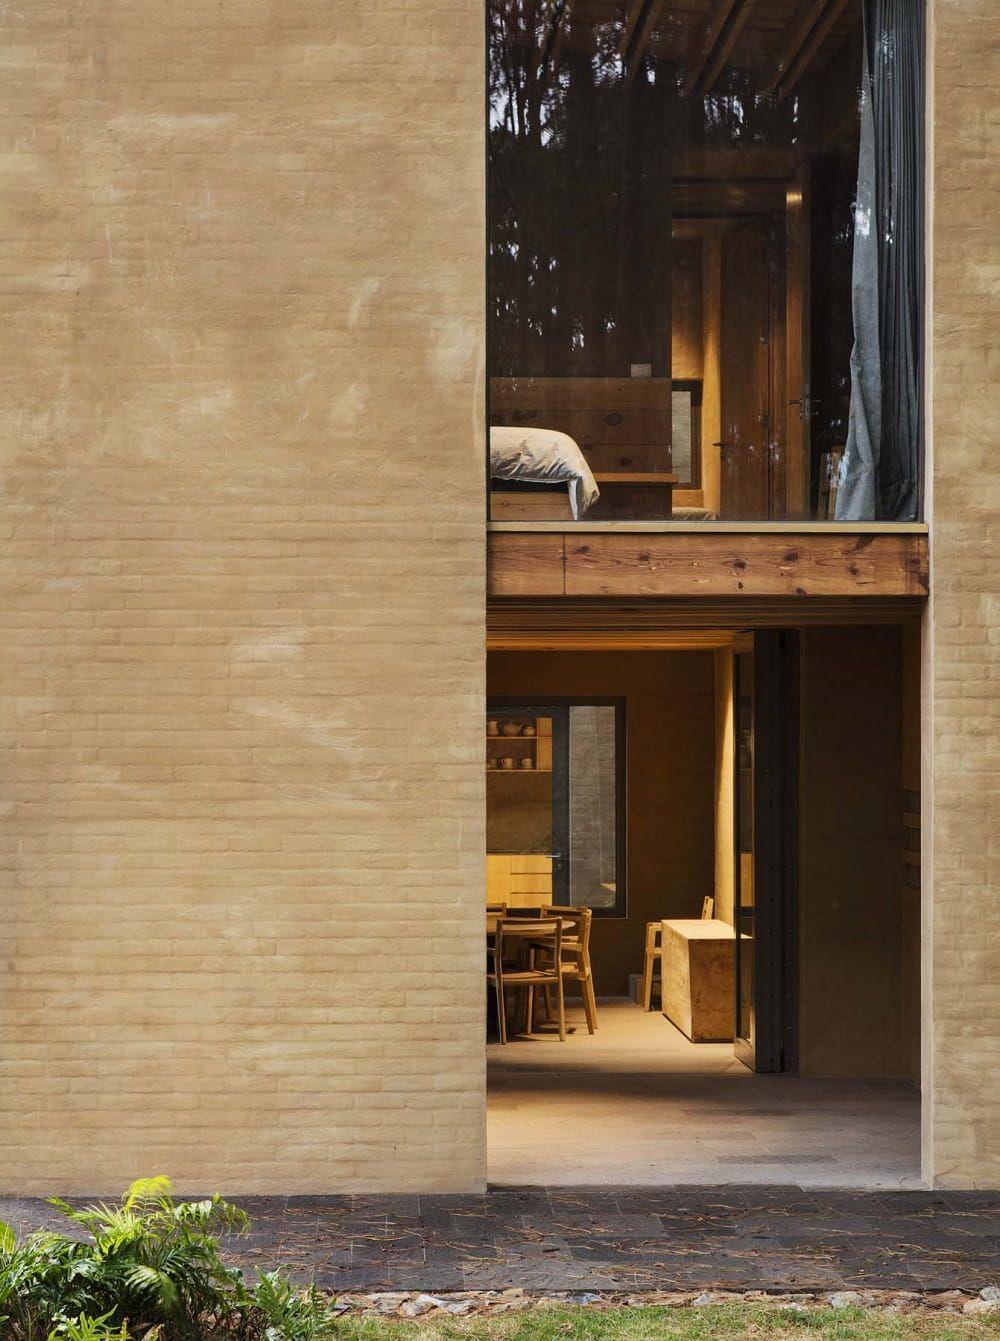 Houses Designed by Taller Hector Barroso Above Valle de